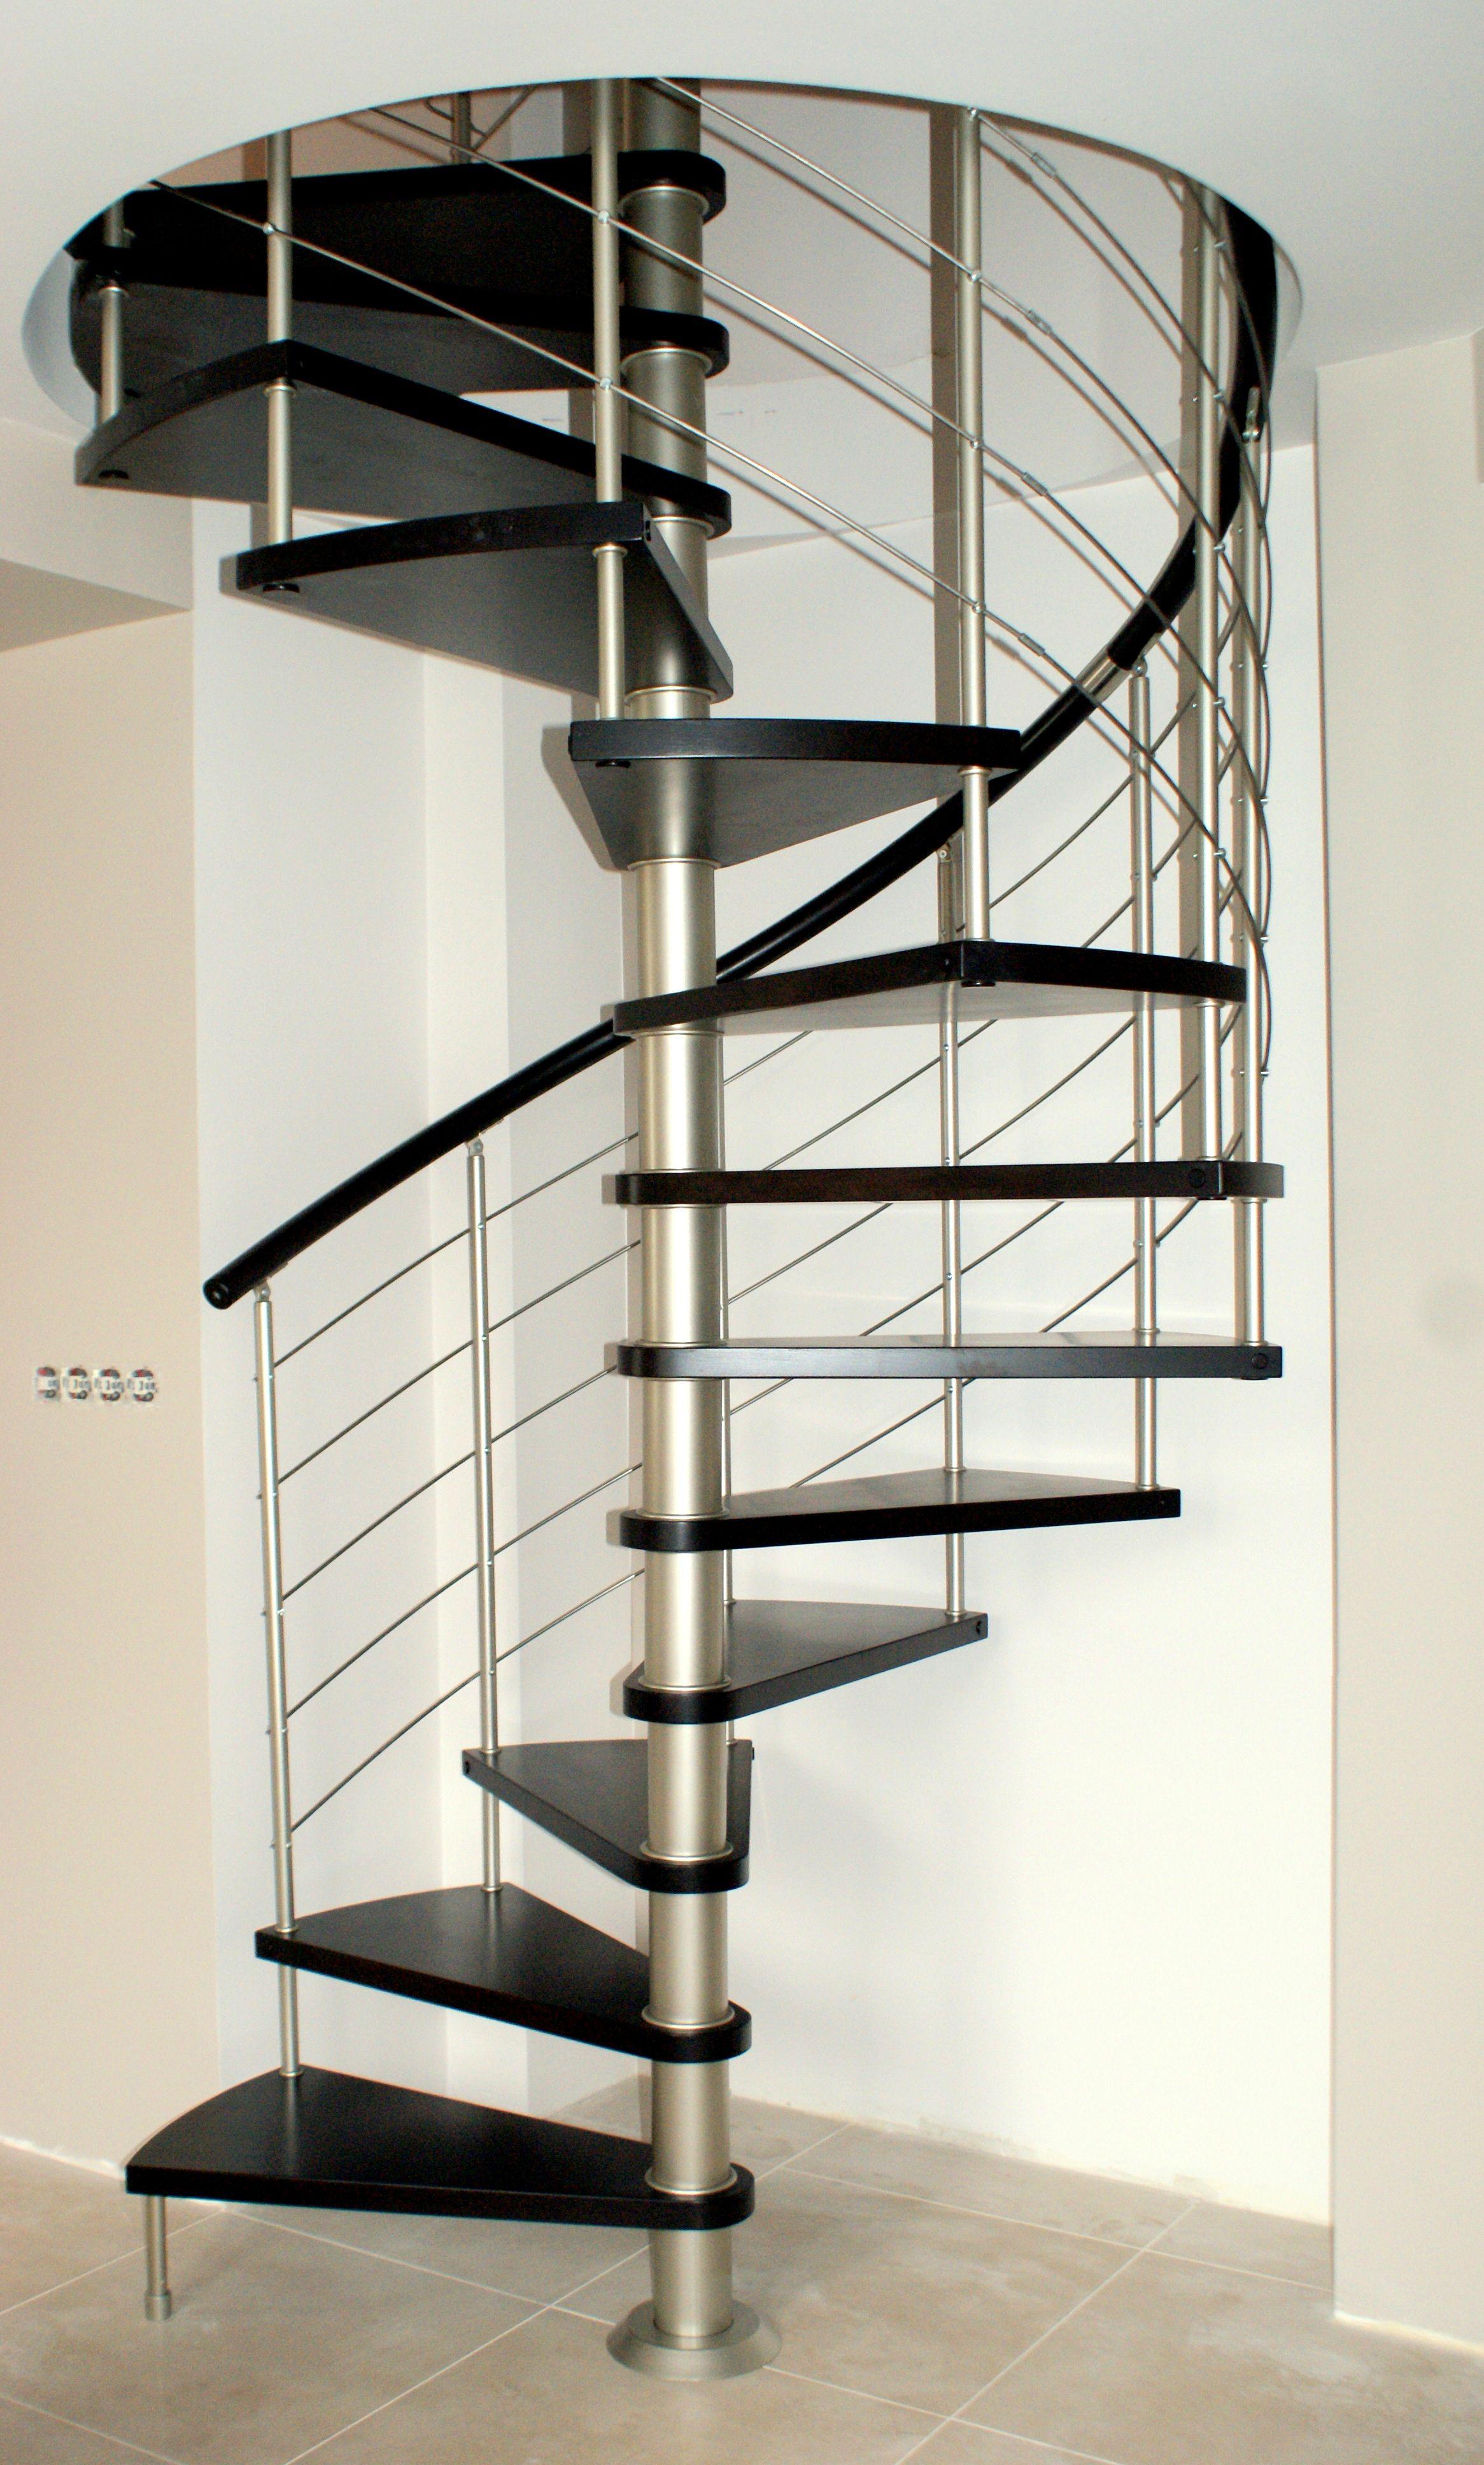 Duda Model Venecja Stairs Home Decor Home